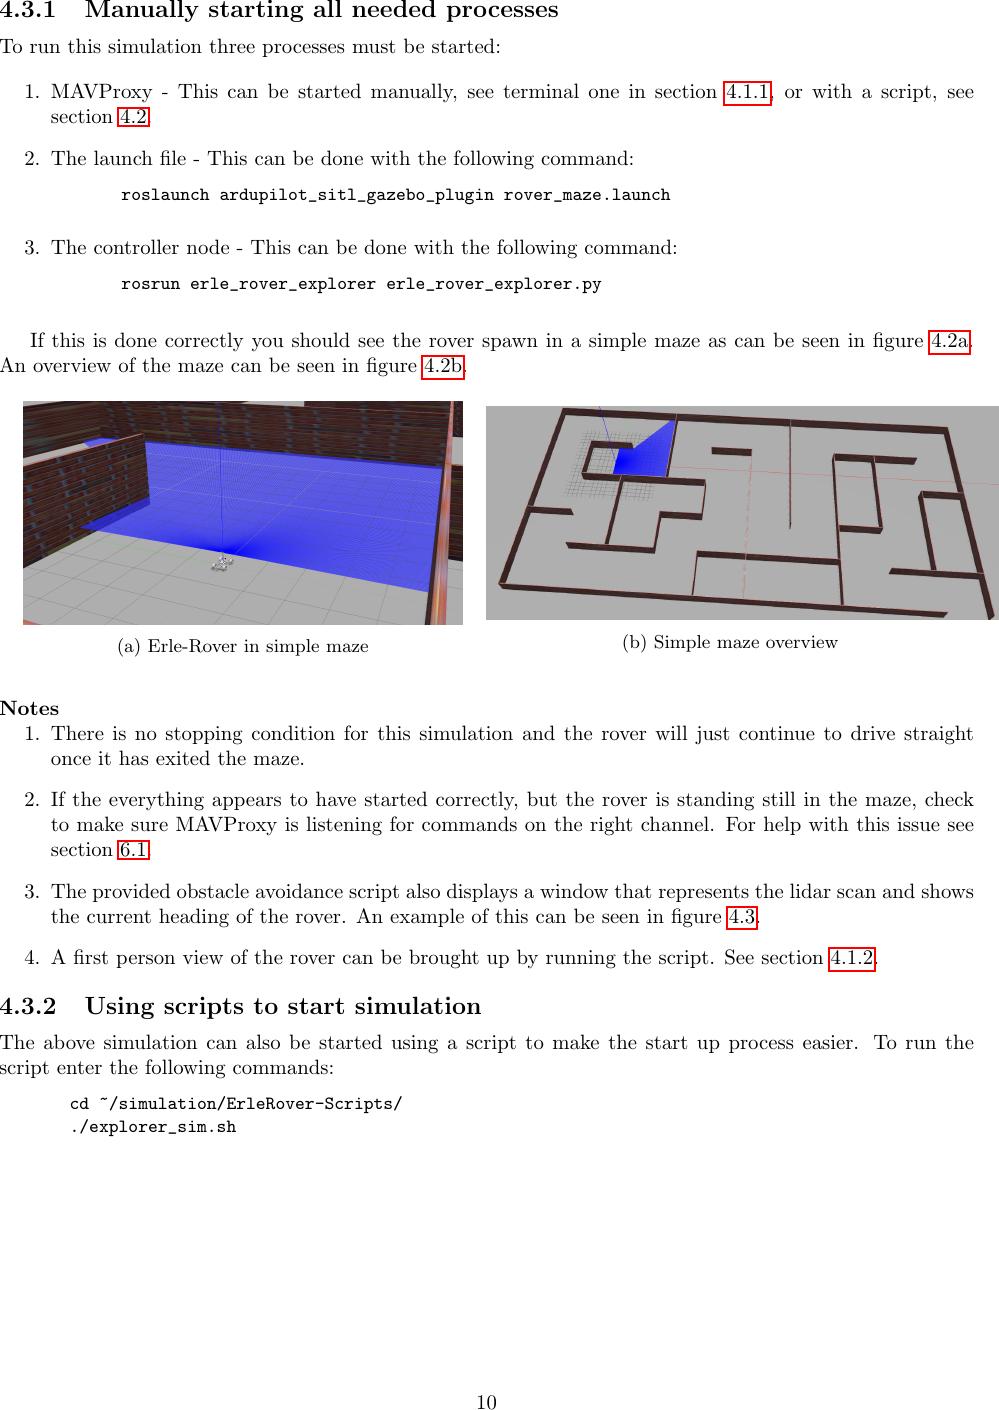 ROS Gazebo Installation Guide